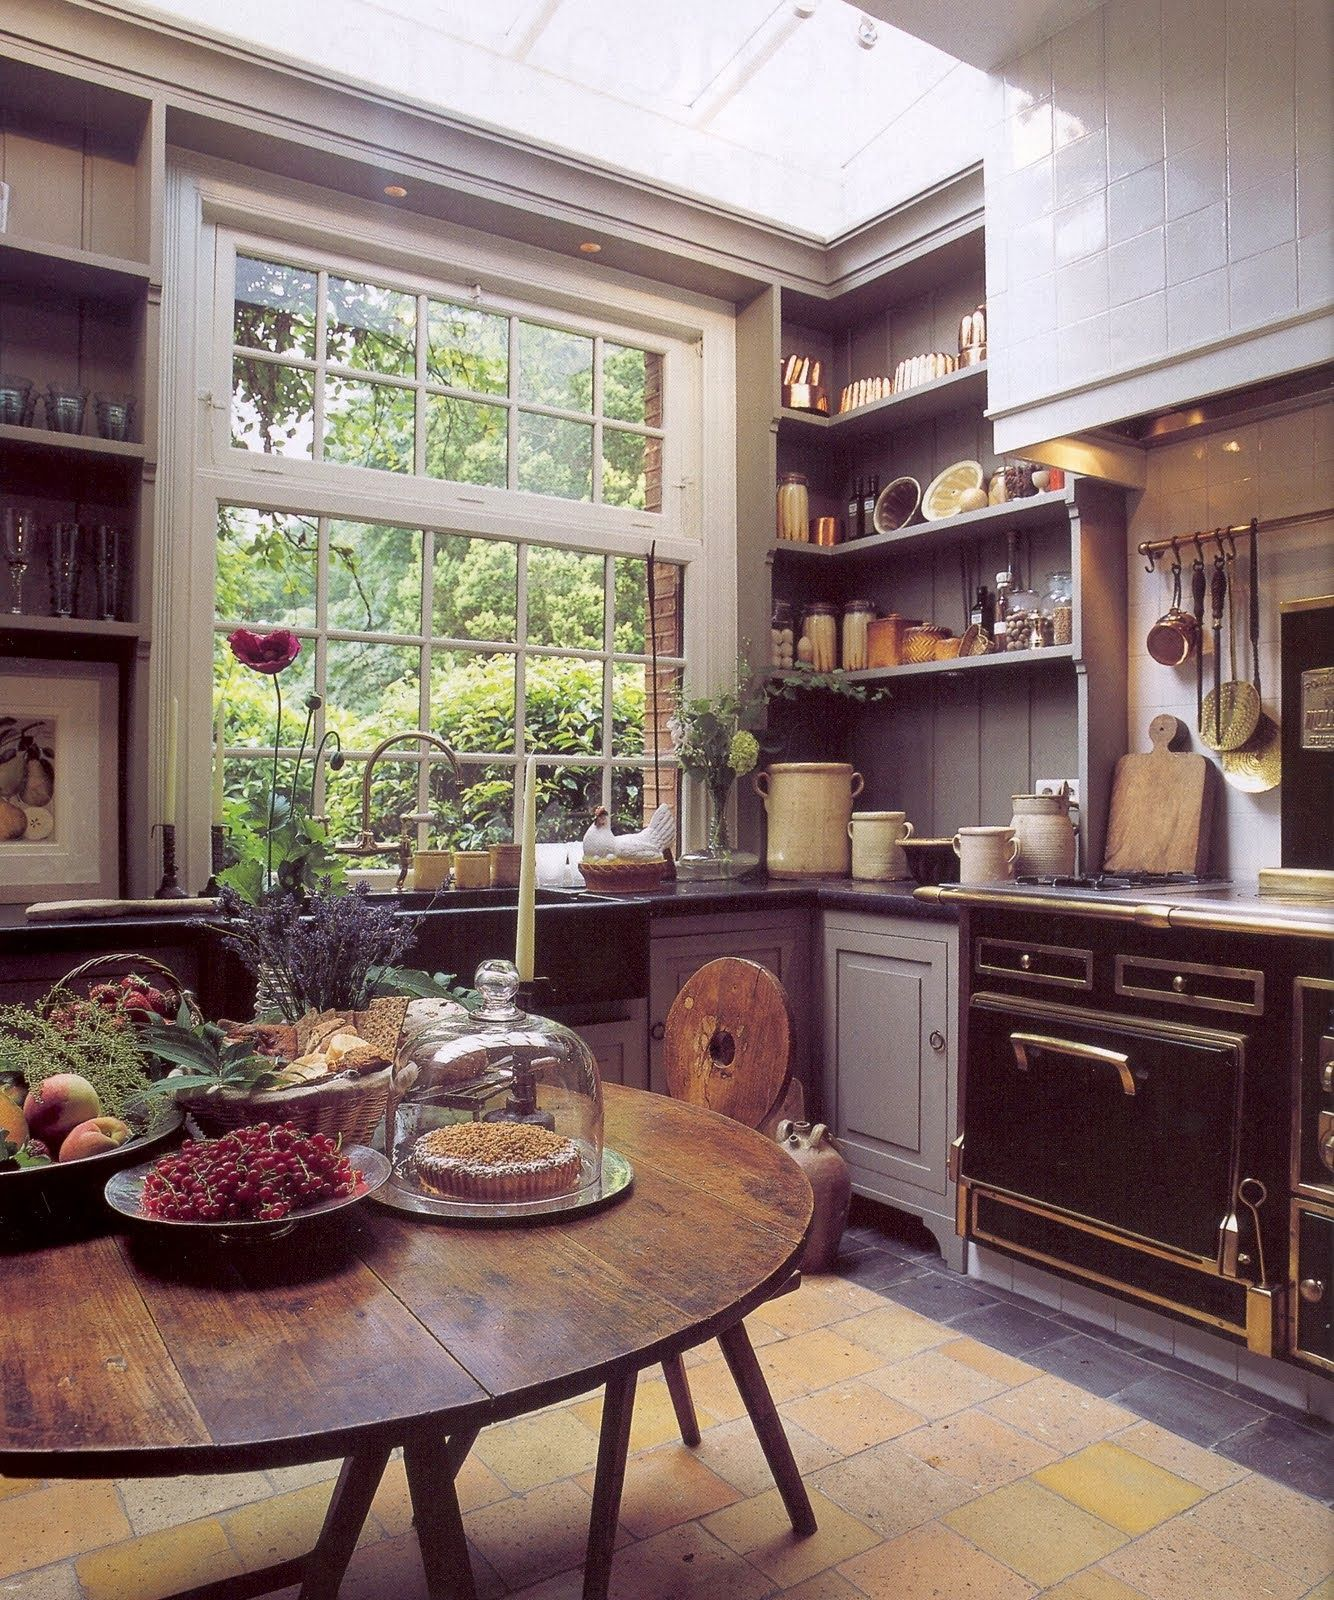 boho kitchen decor boho kitchen decor home kitchens boho kitchen on kitchen decor themes modern id=97129